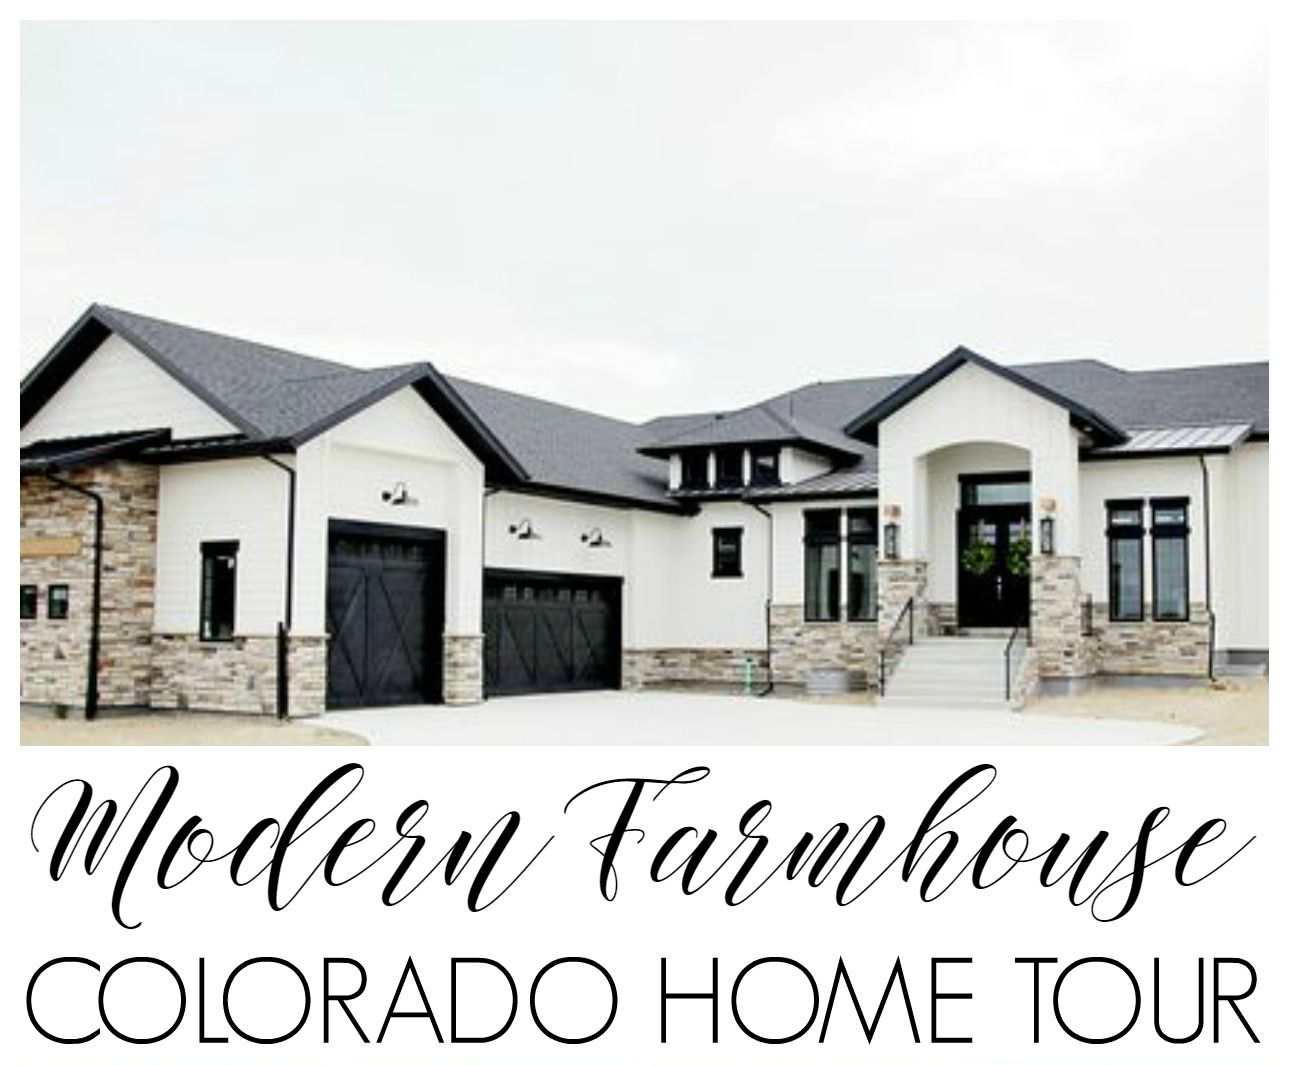 Df5411 esquemas de color casa exteriores con persianas negras - Casas